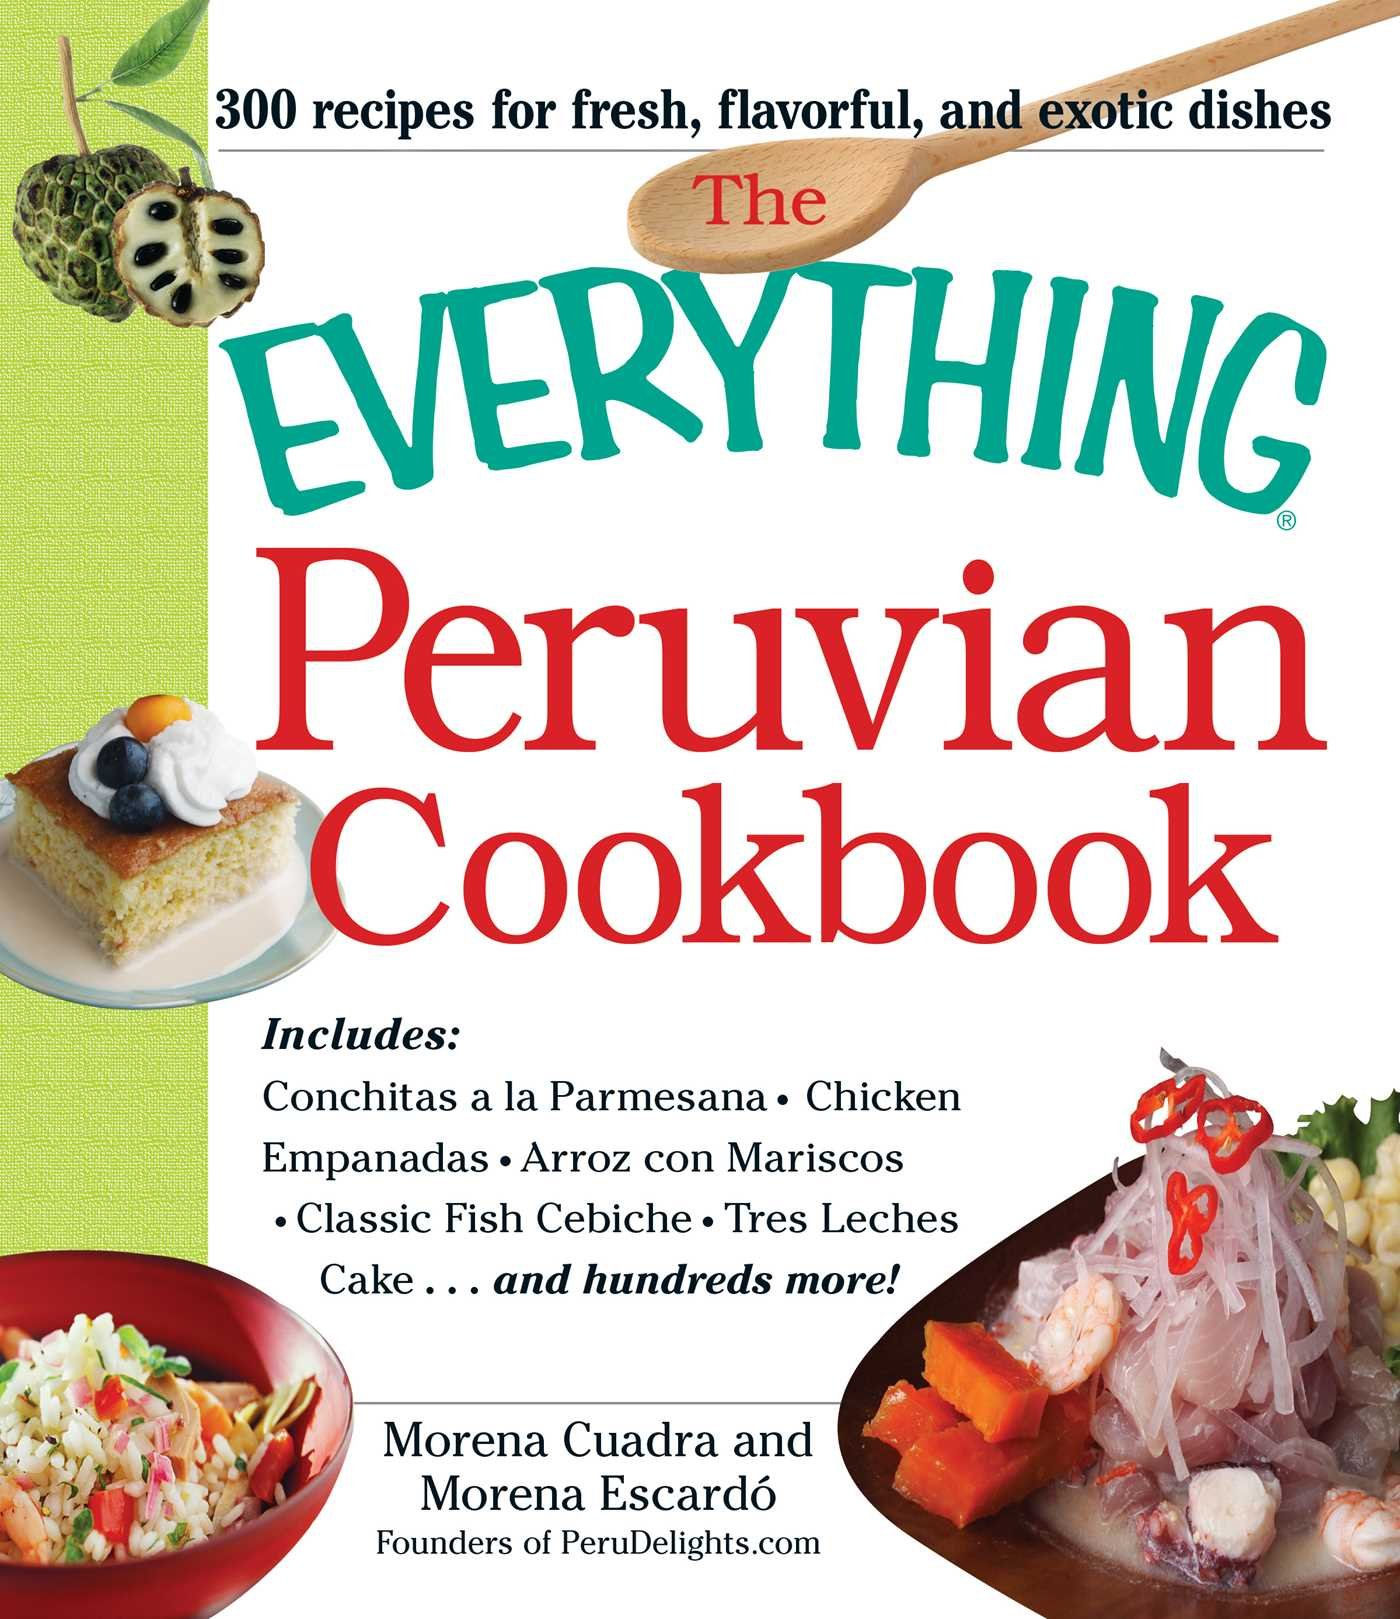 The Everything Peruvian Cookbook: Includes Conchitas a la Parmesana, Chicken Empanadas, Arroz con